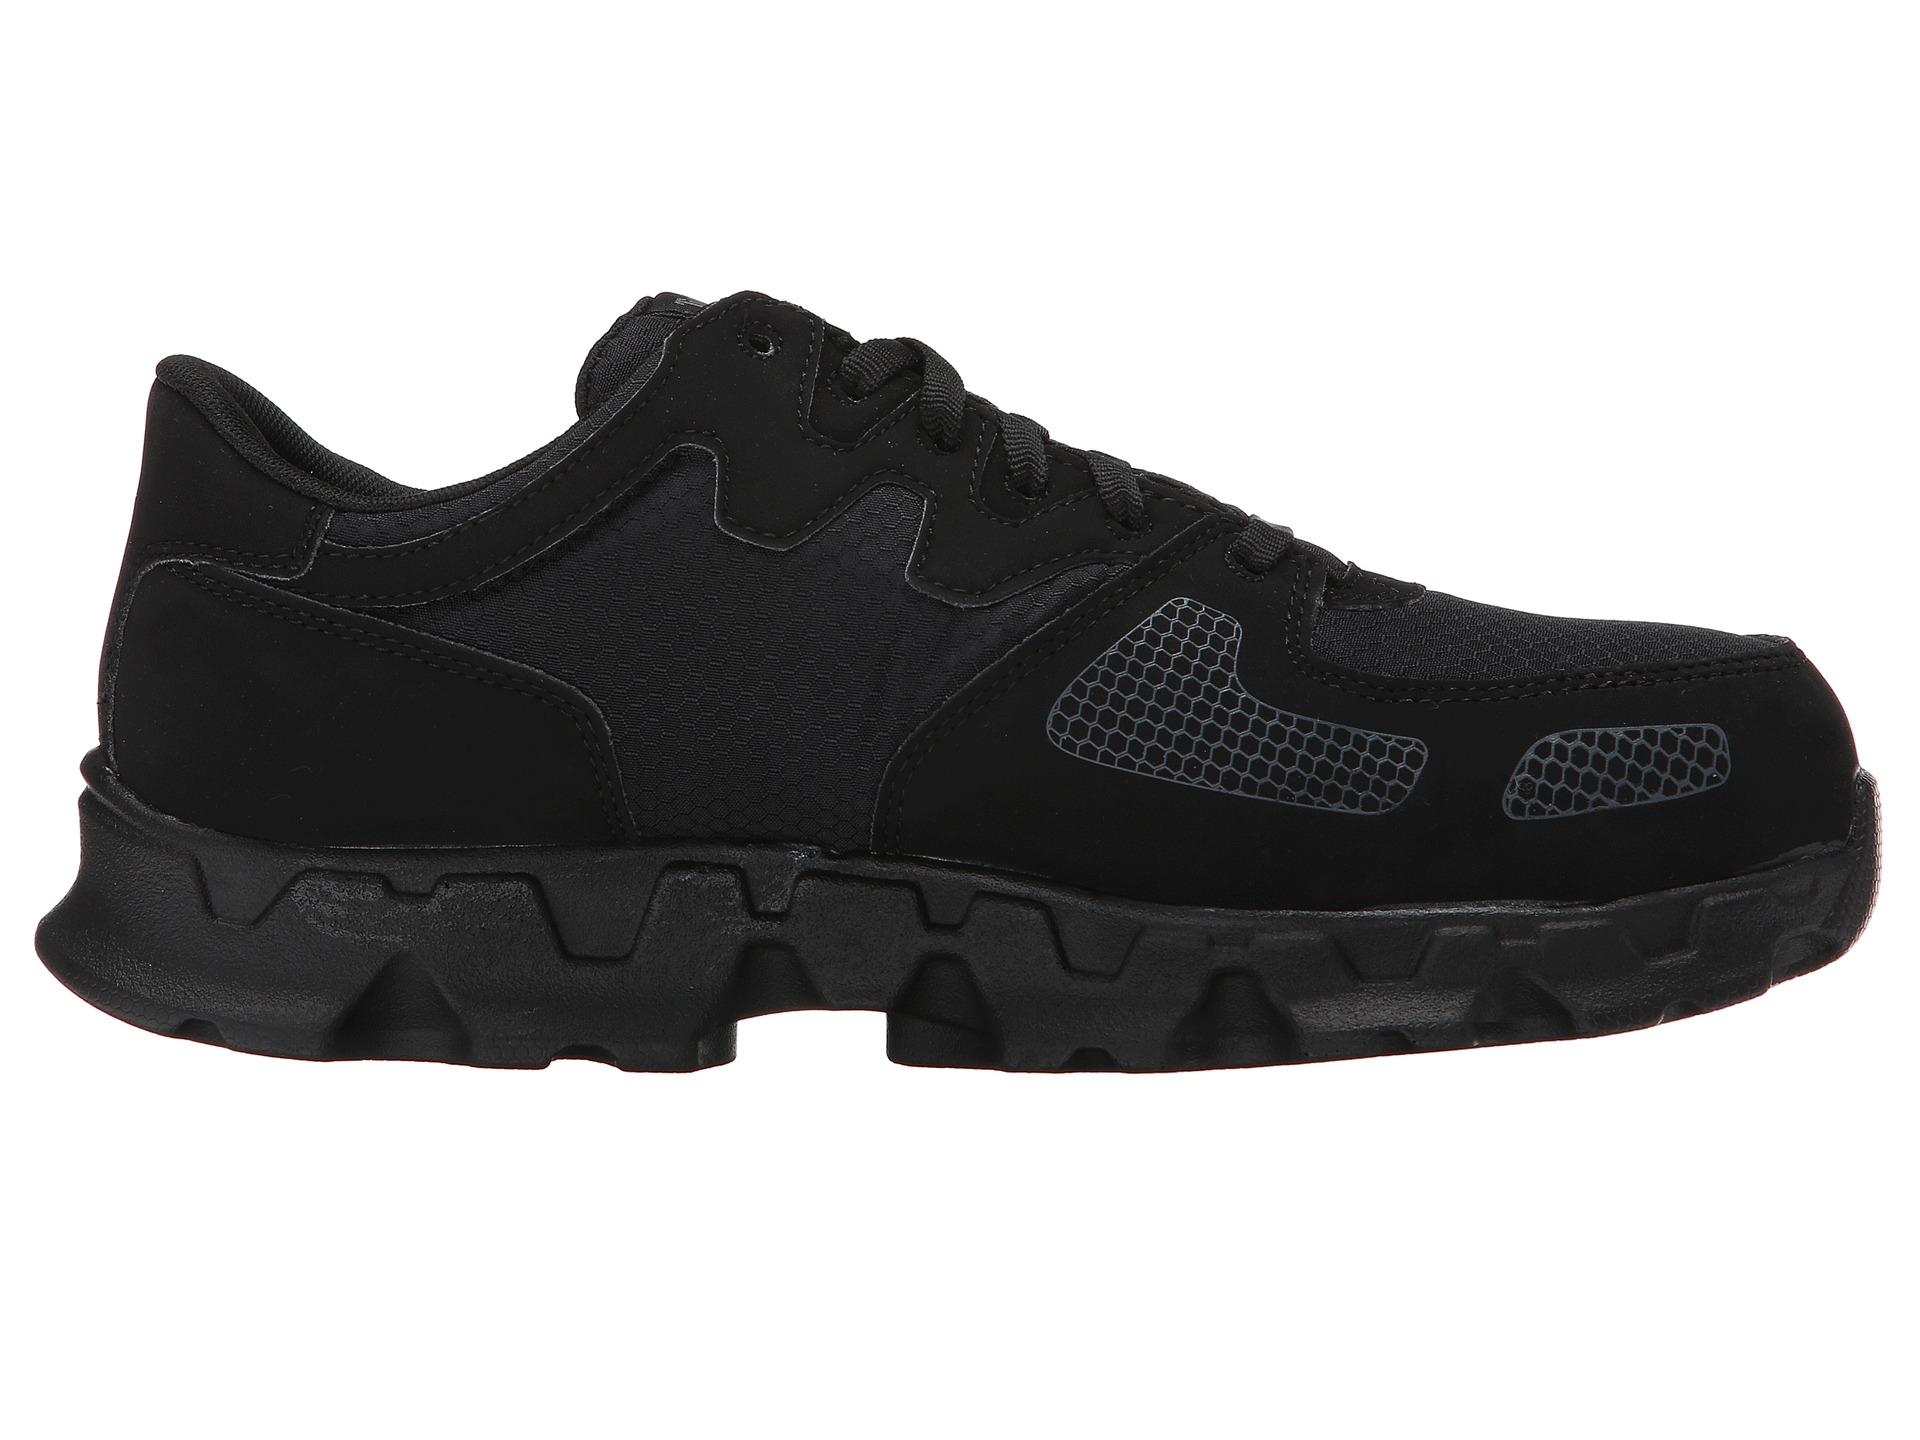 Safety Alloy Toe Shoes For Men Under